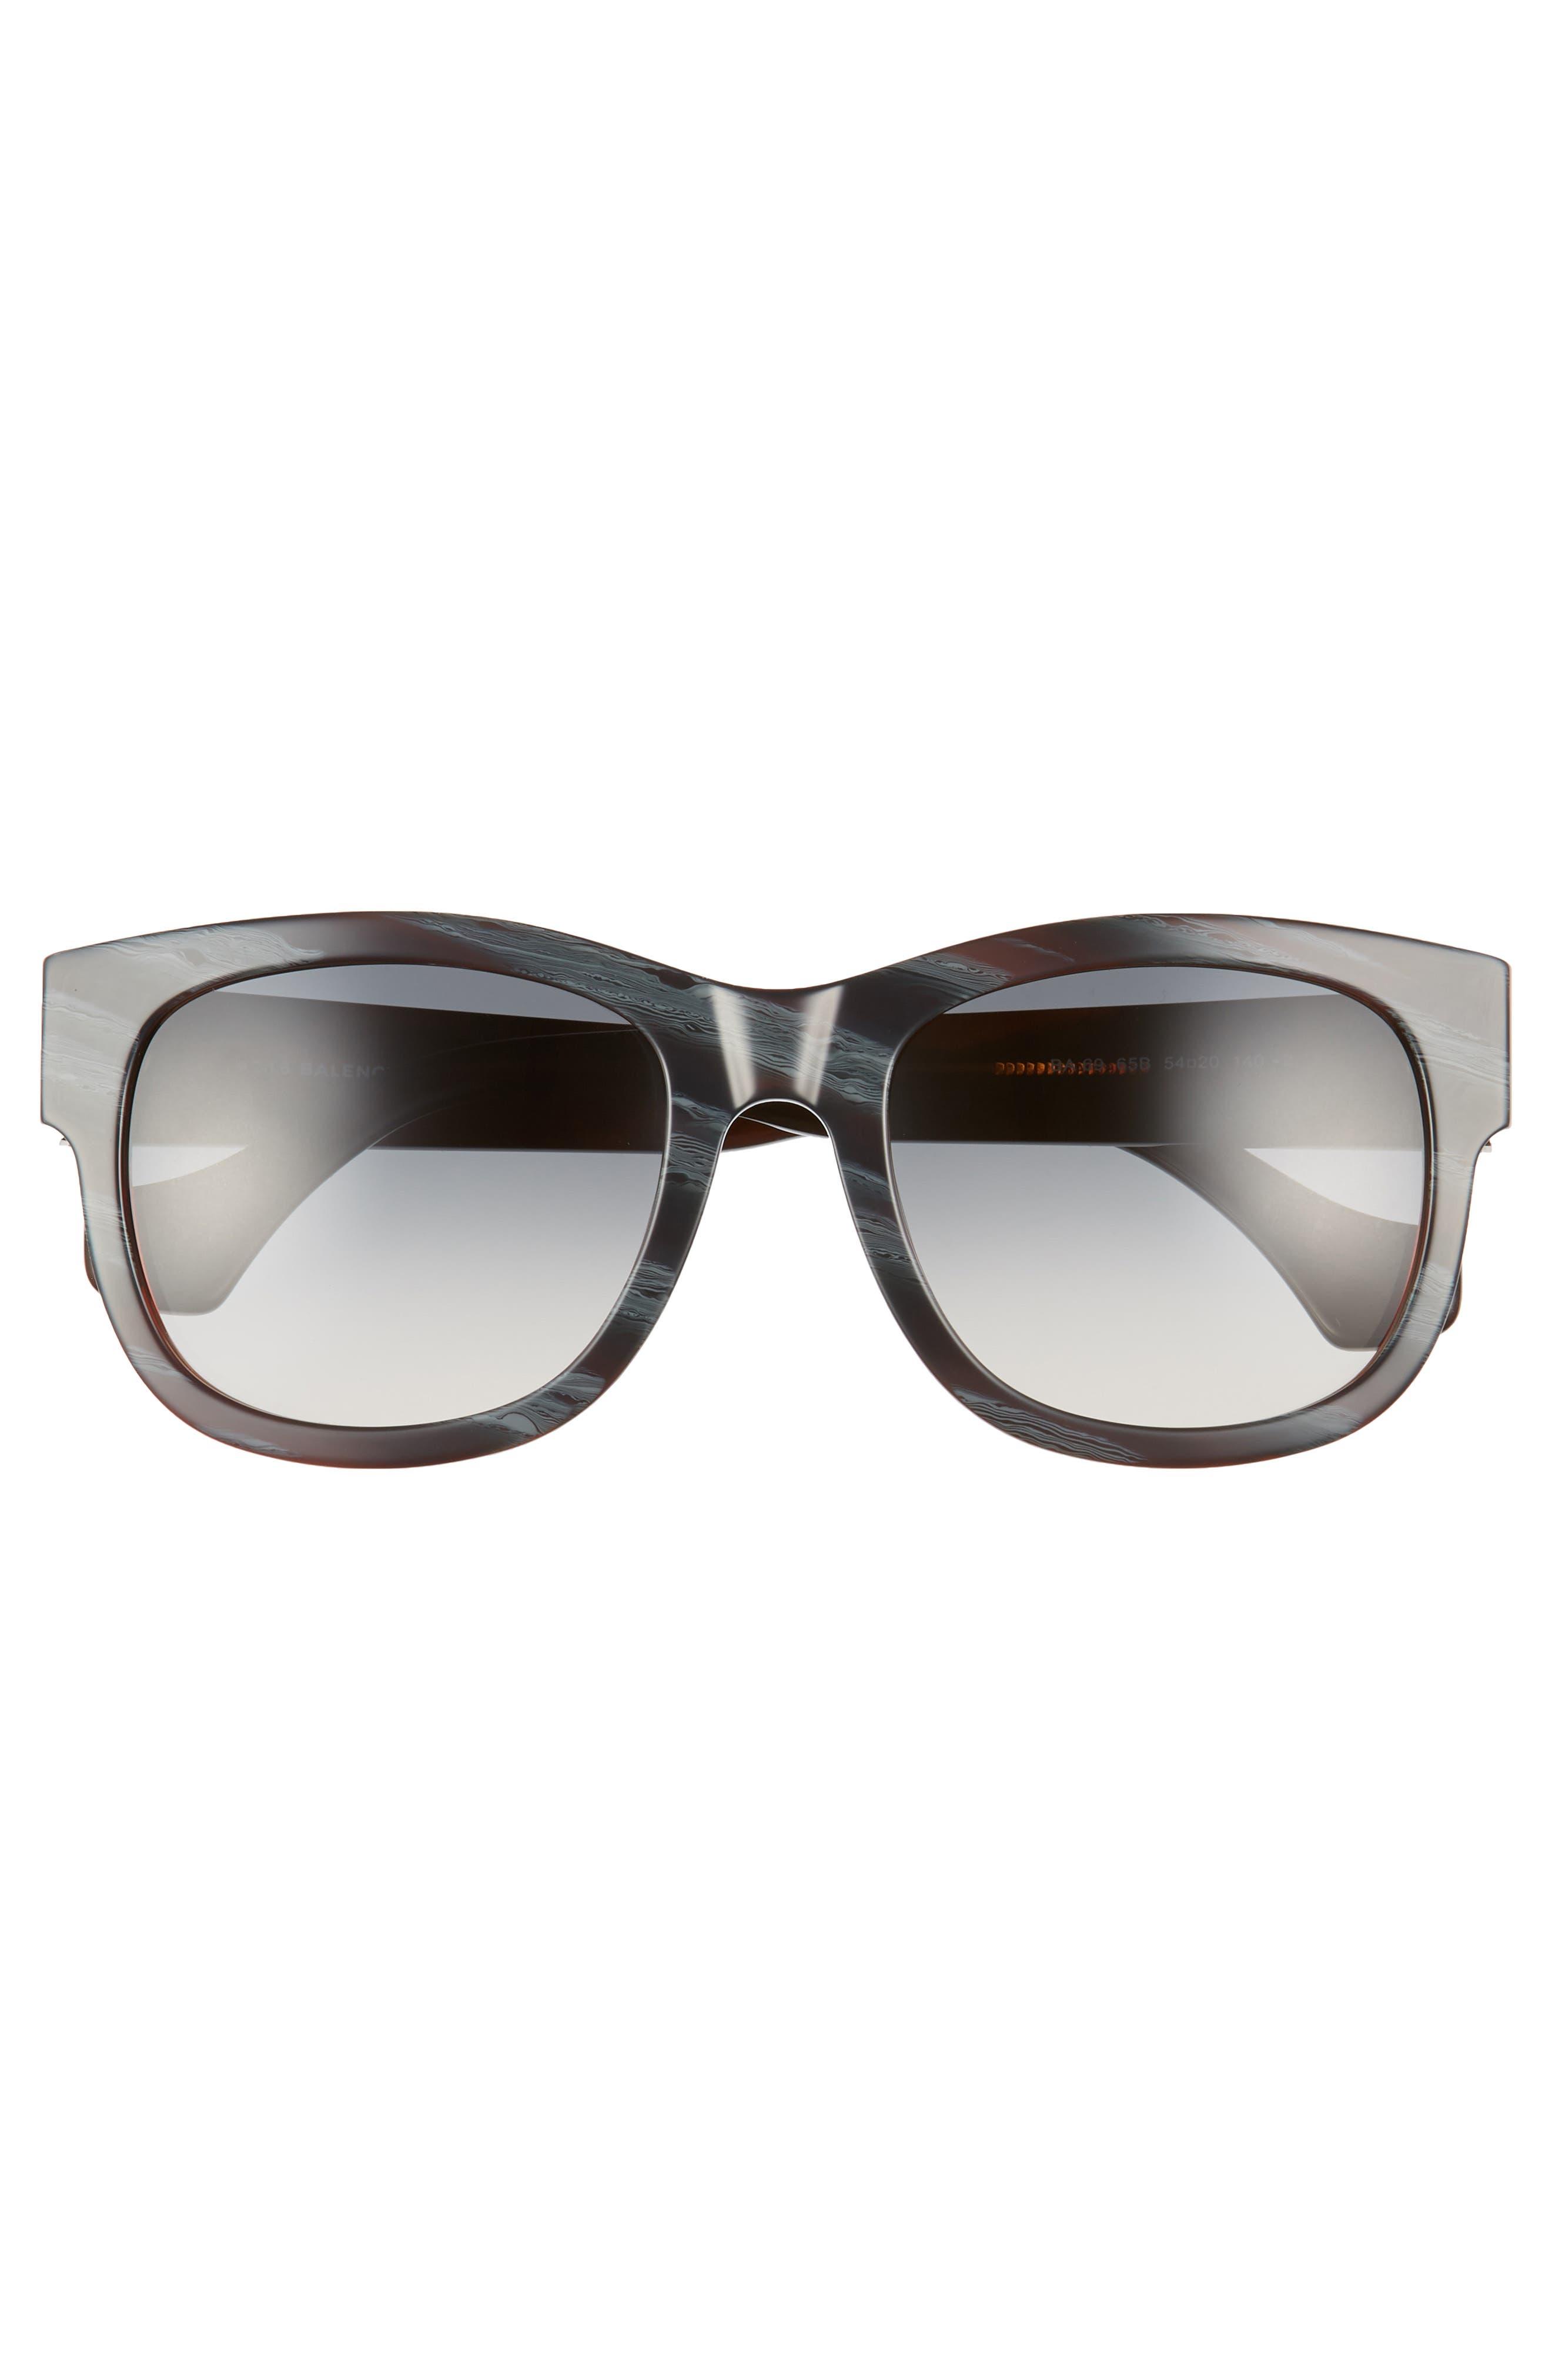 54mm Retro Sunglasses,                             Alternate thumbnail 3, color,                             400